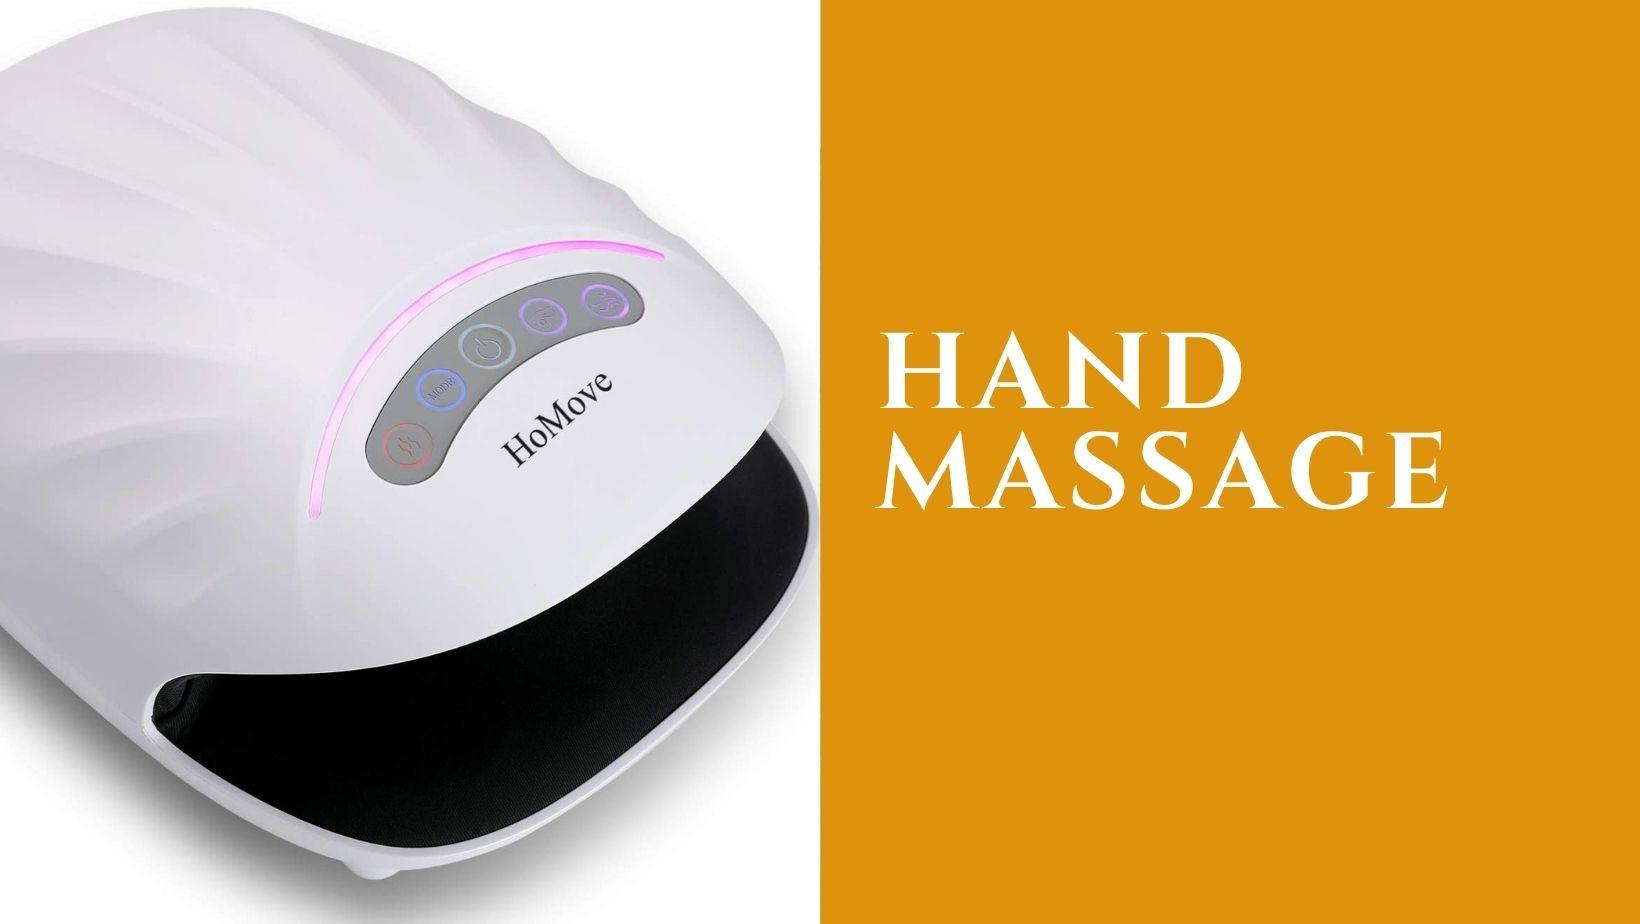 Solid MAssage Equipment - Hand Massager